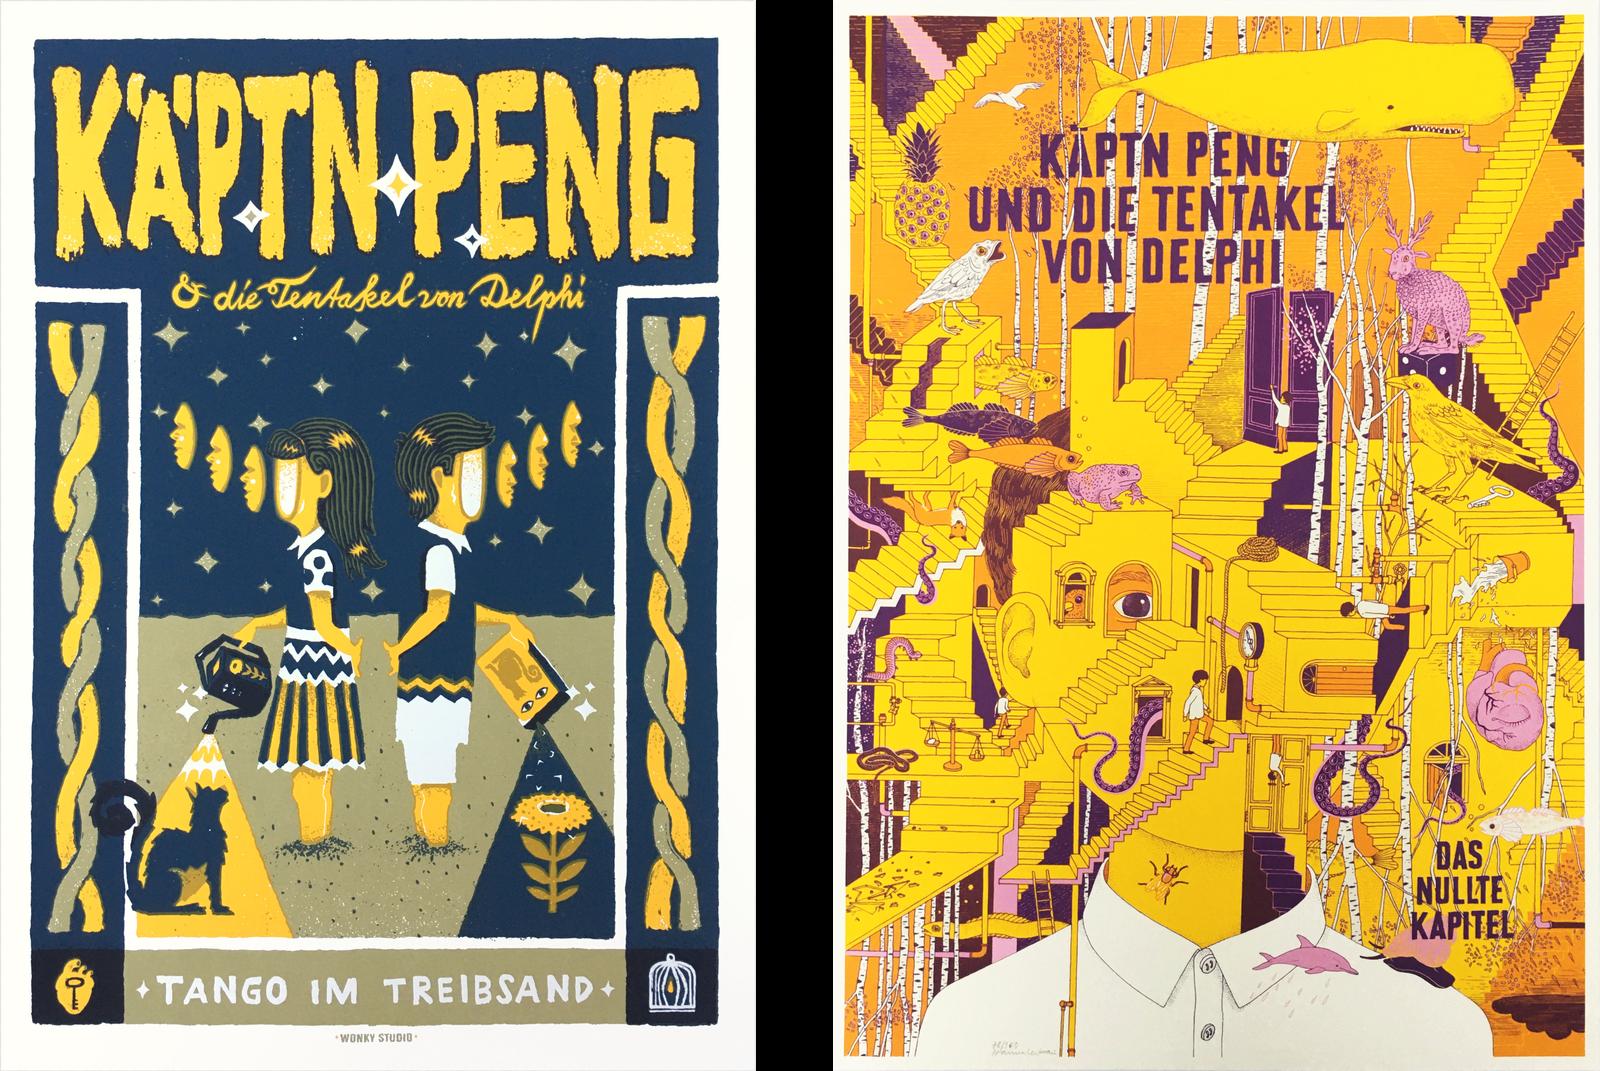 KÄPTN PENG & DIE TENTAKEL VON DELPHI Siebdruck Poster